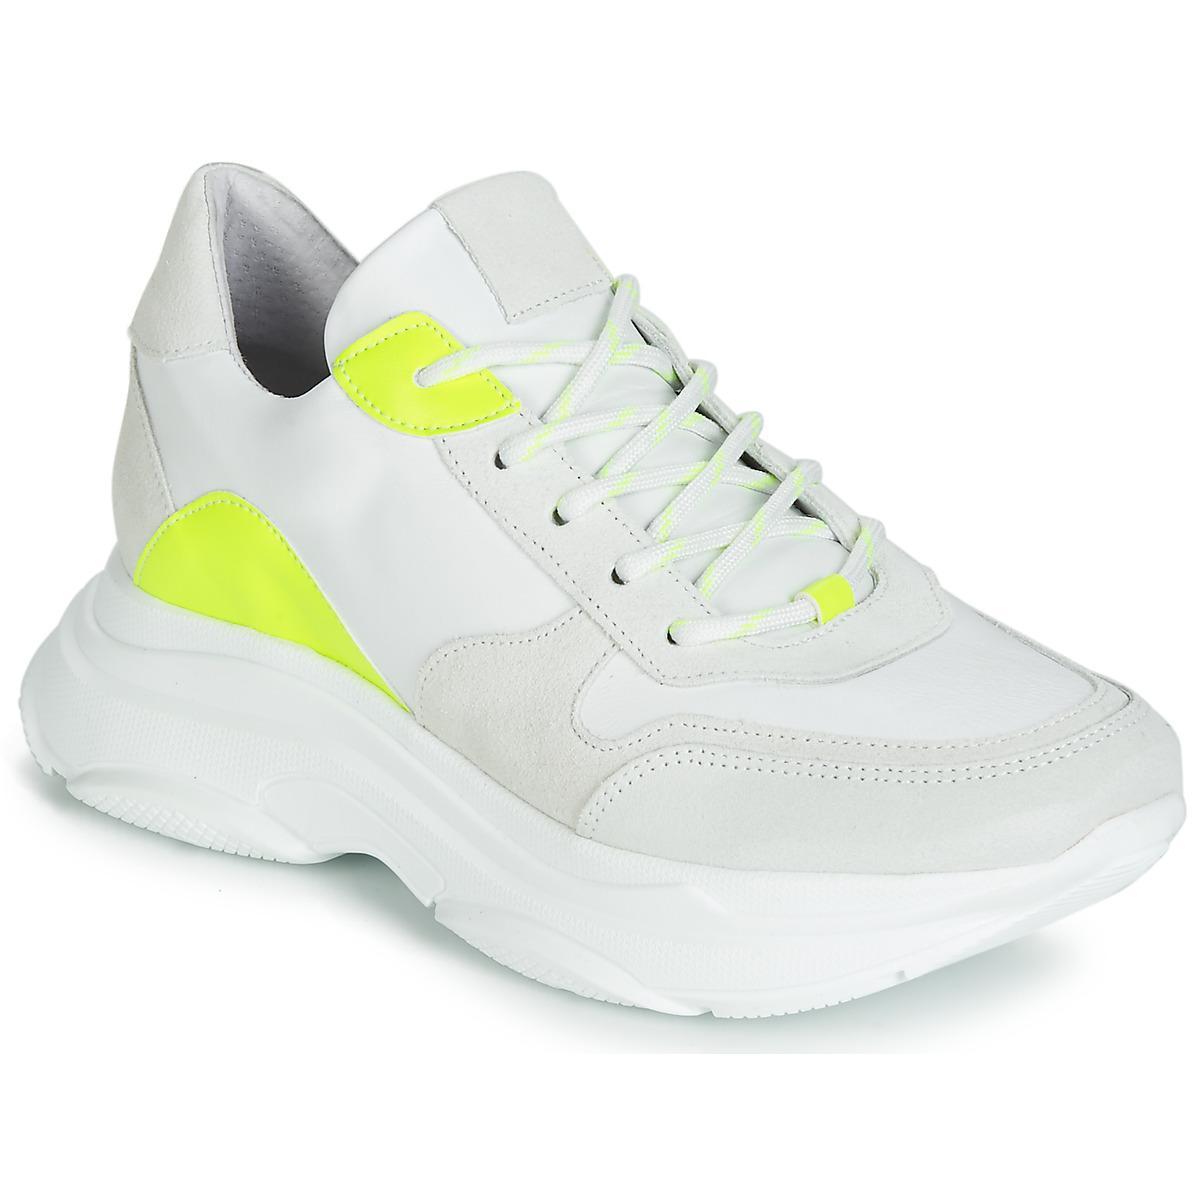 67789eace4d Steve Madden Zela Shoes (trainers) - Lyst